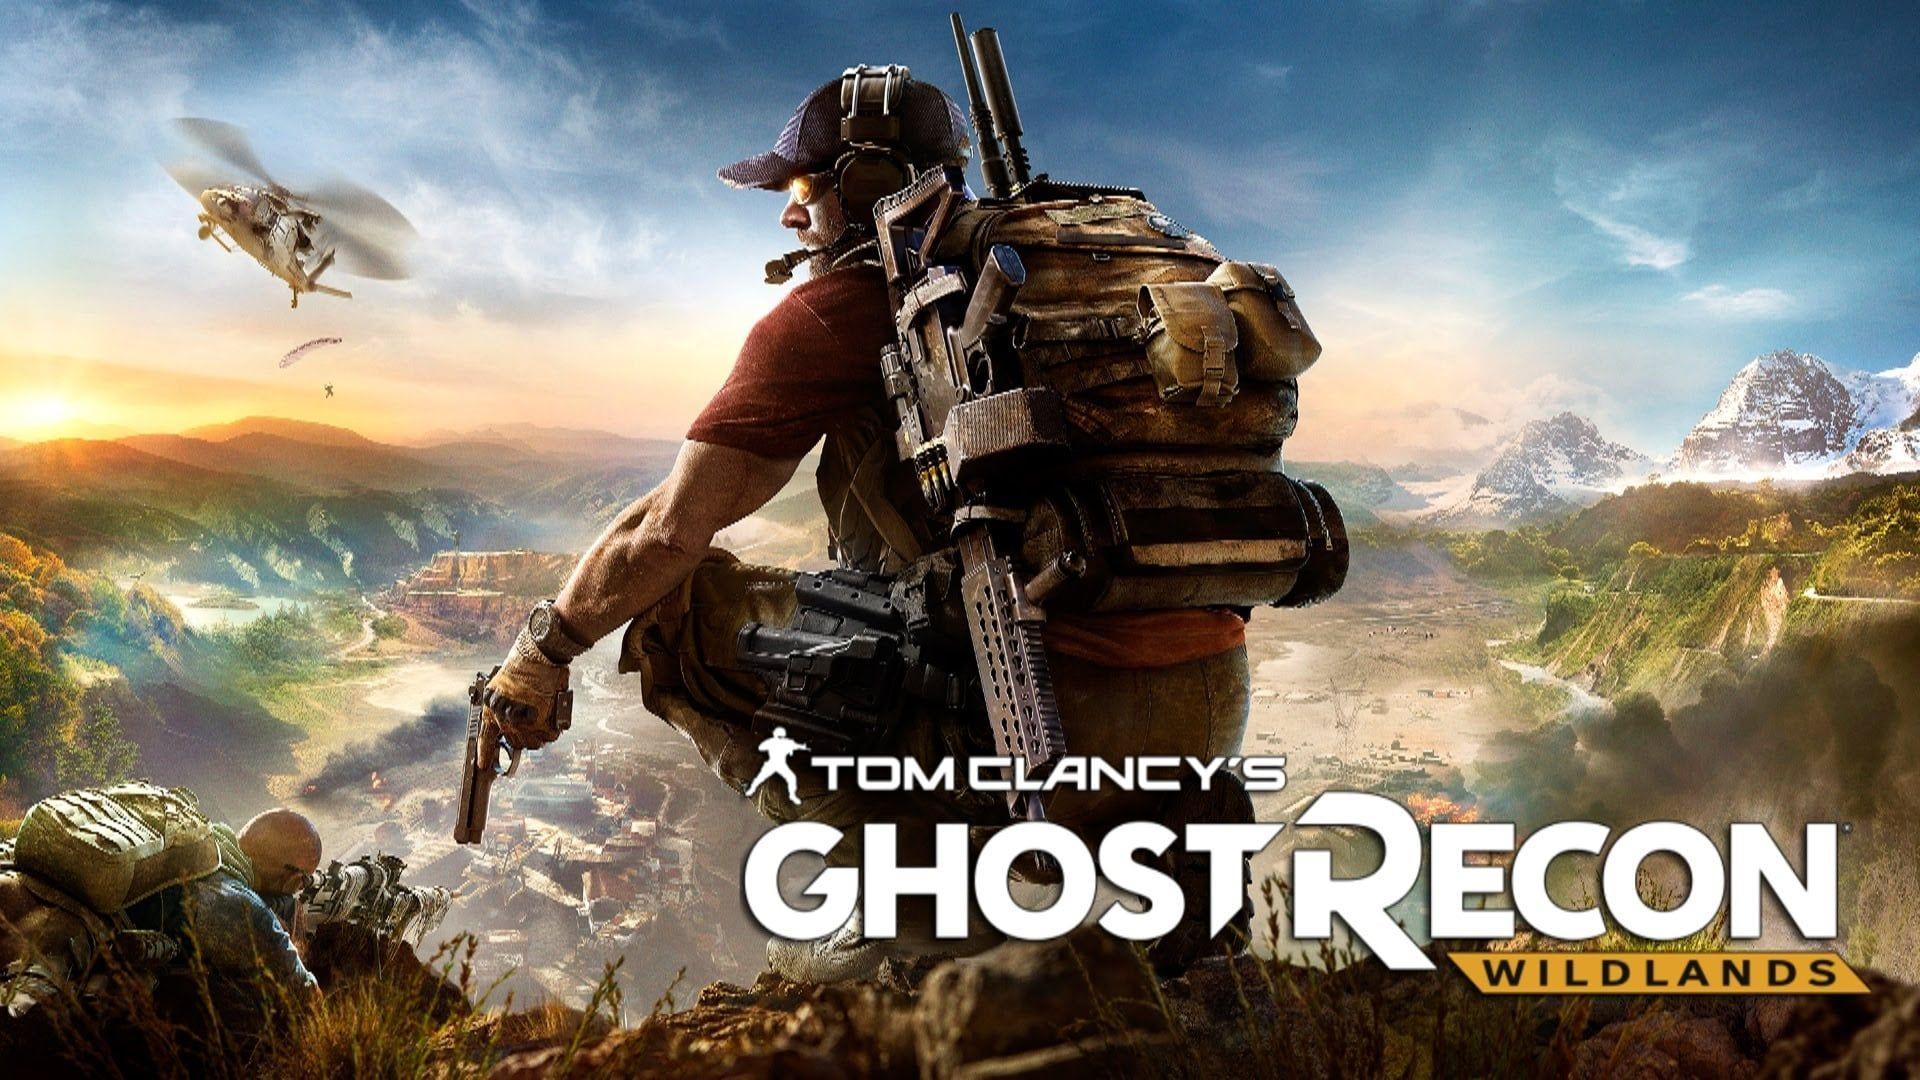 Ghost Recon Wildlands Update Version 1.29 New Full Patch